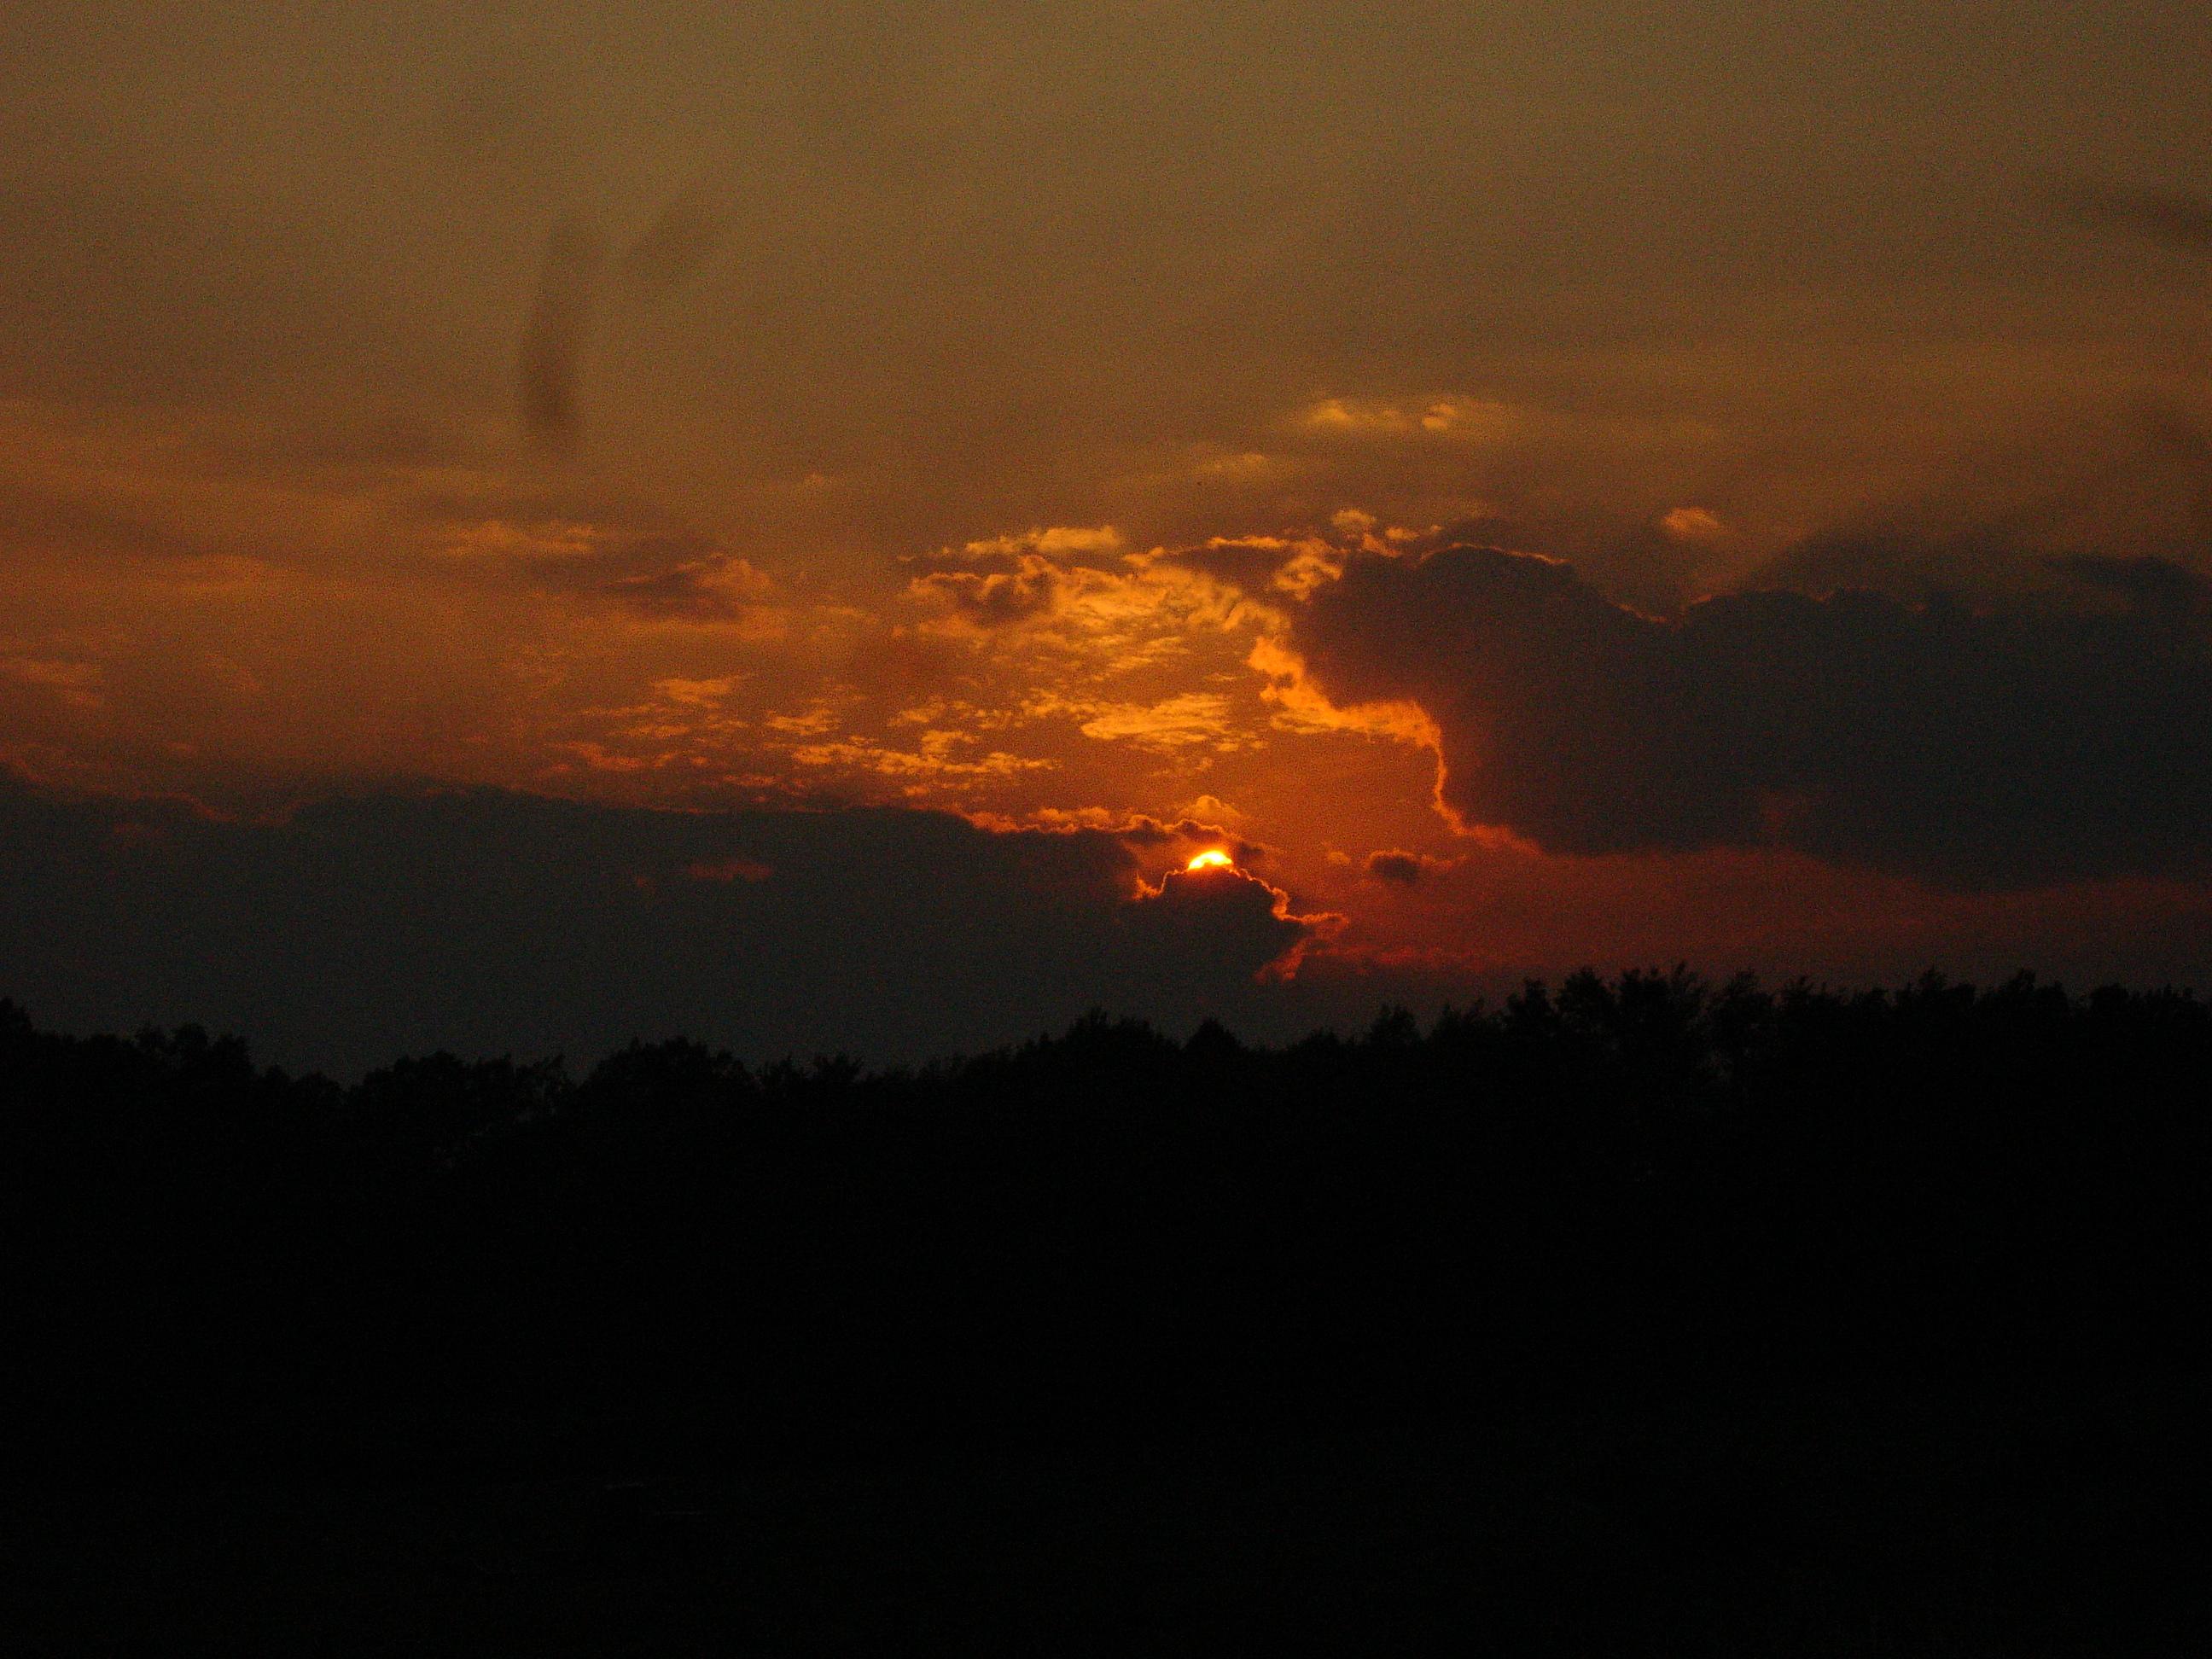 Sunset at 261